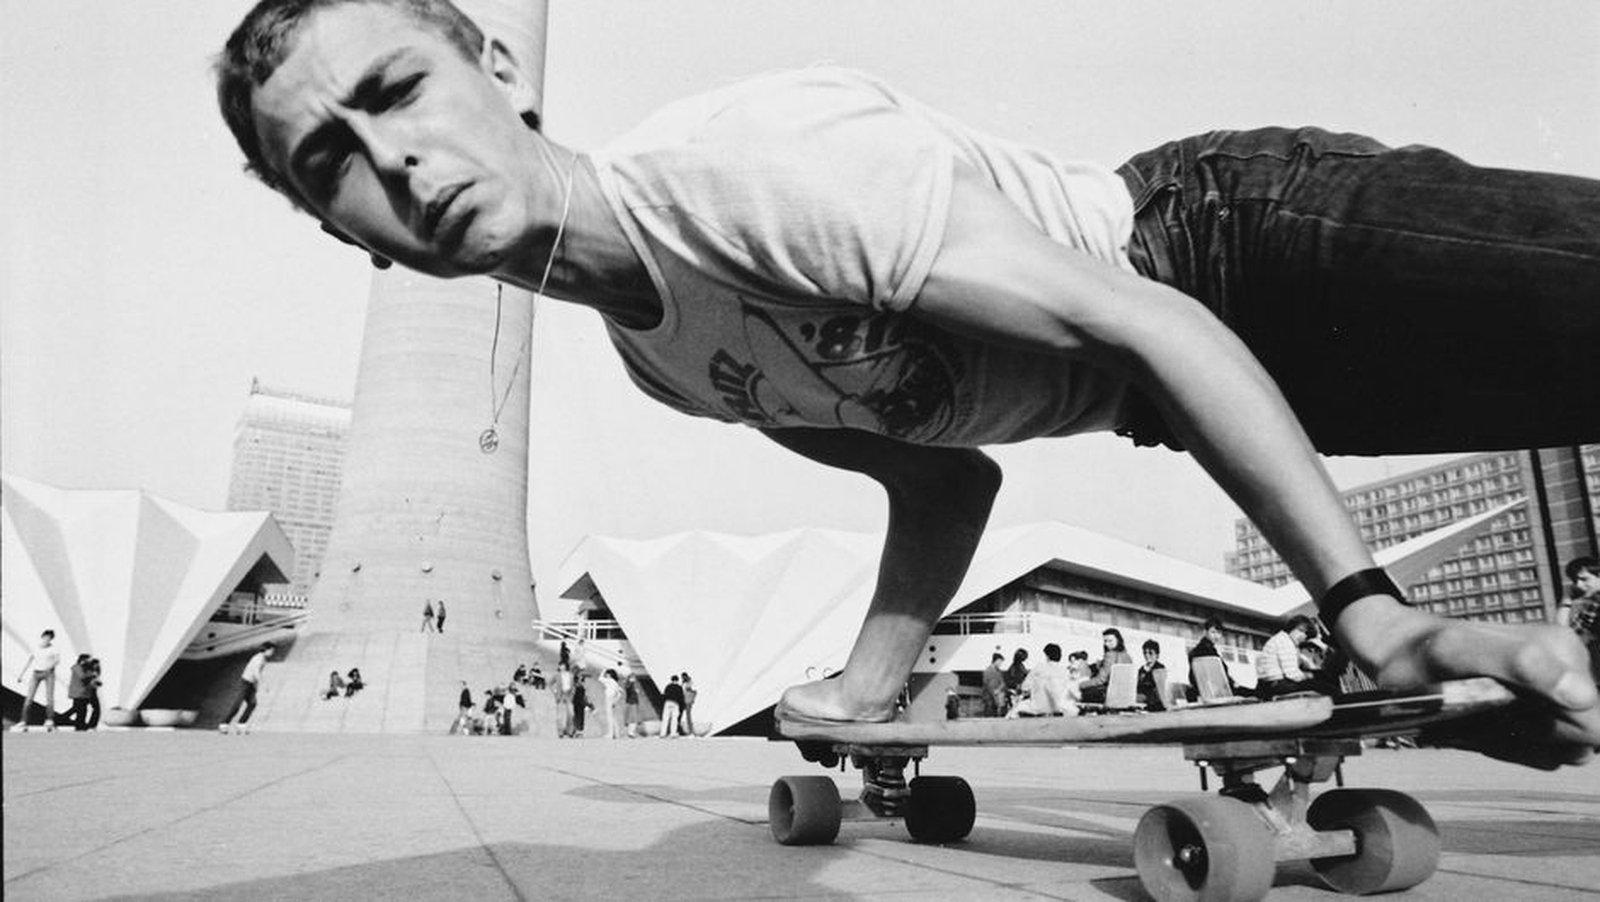 This Ain't California: Skateboard culture in East Berlin